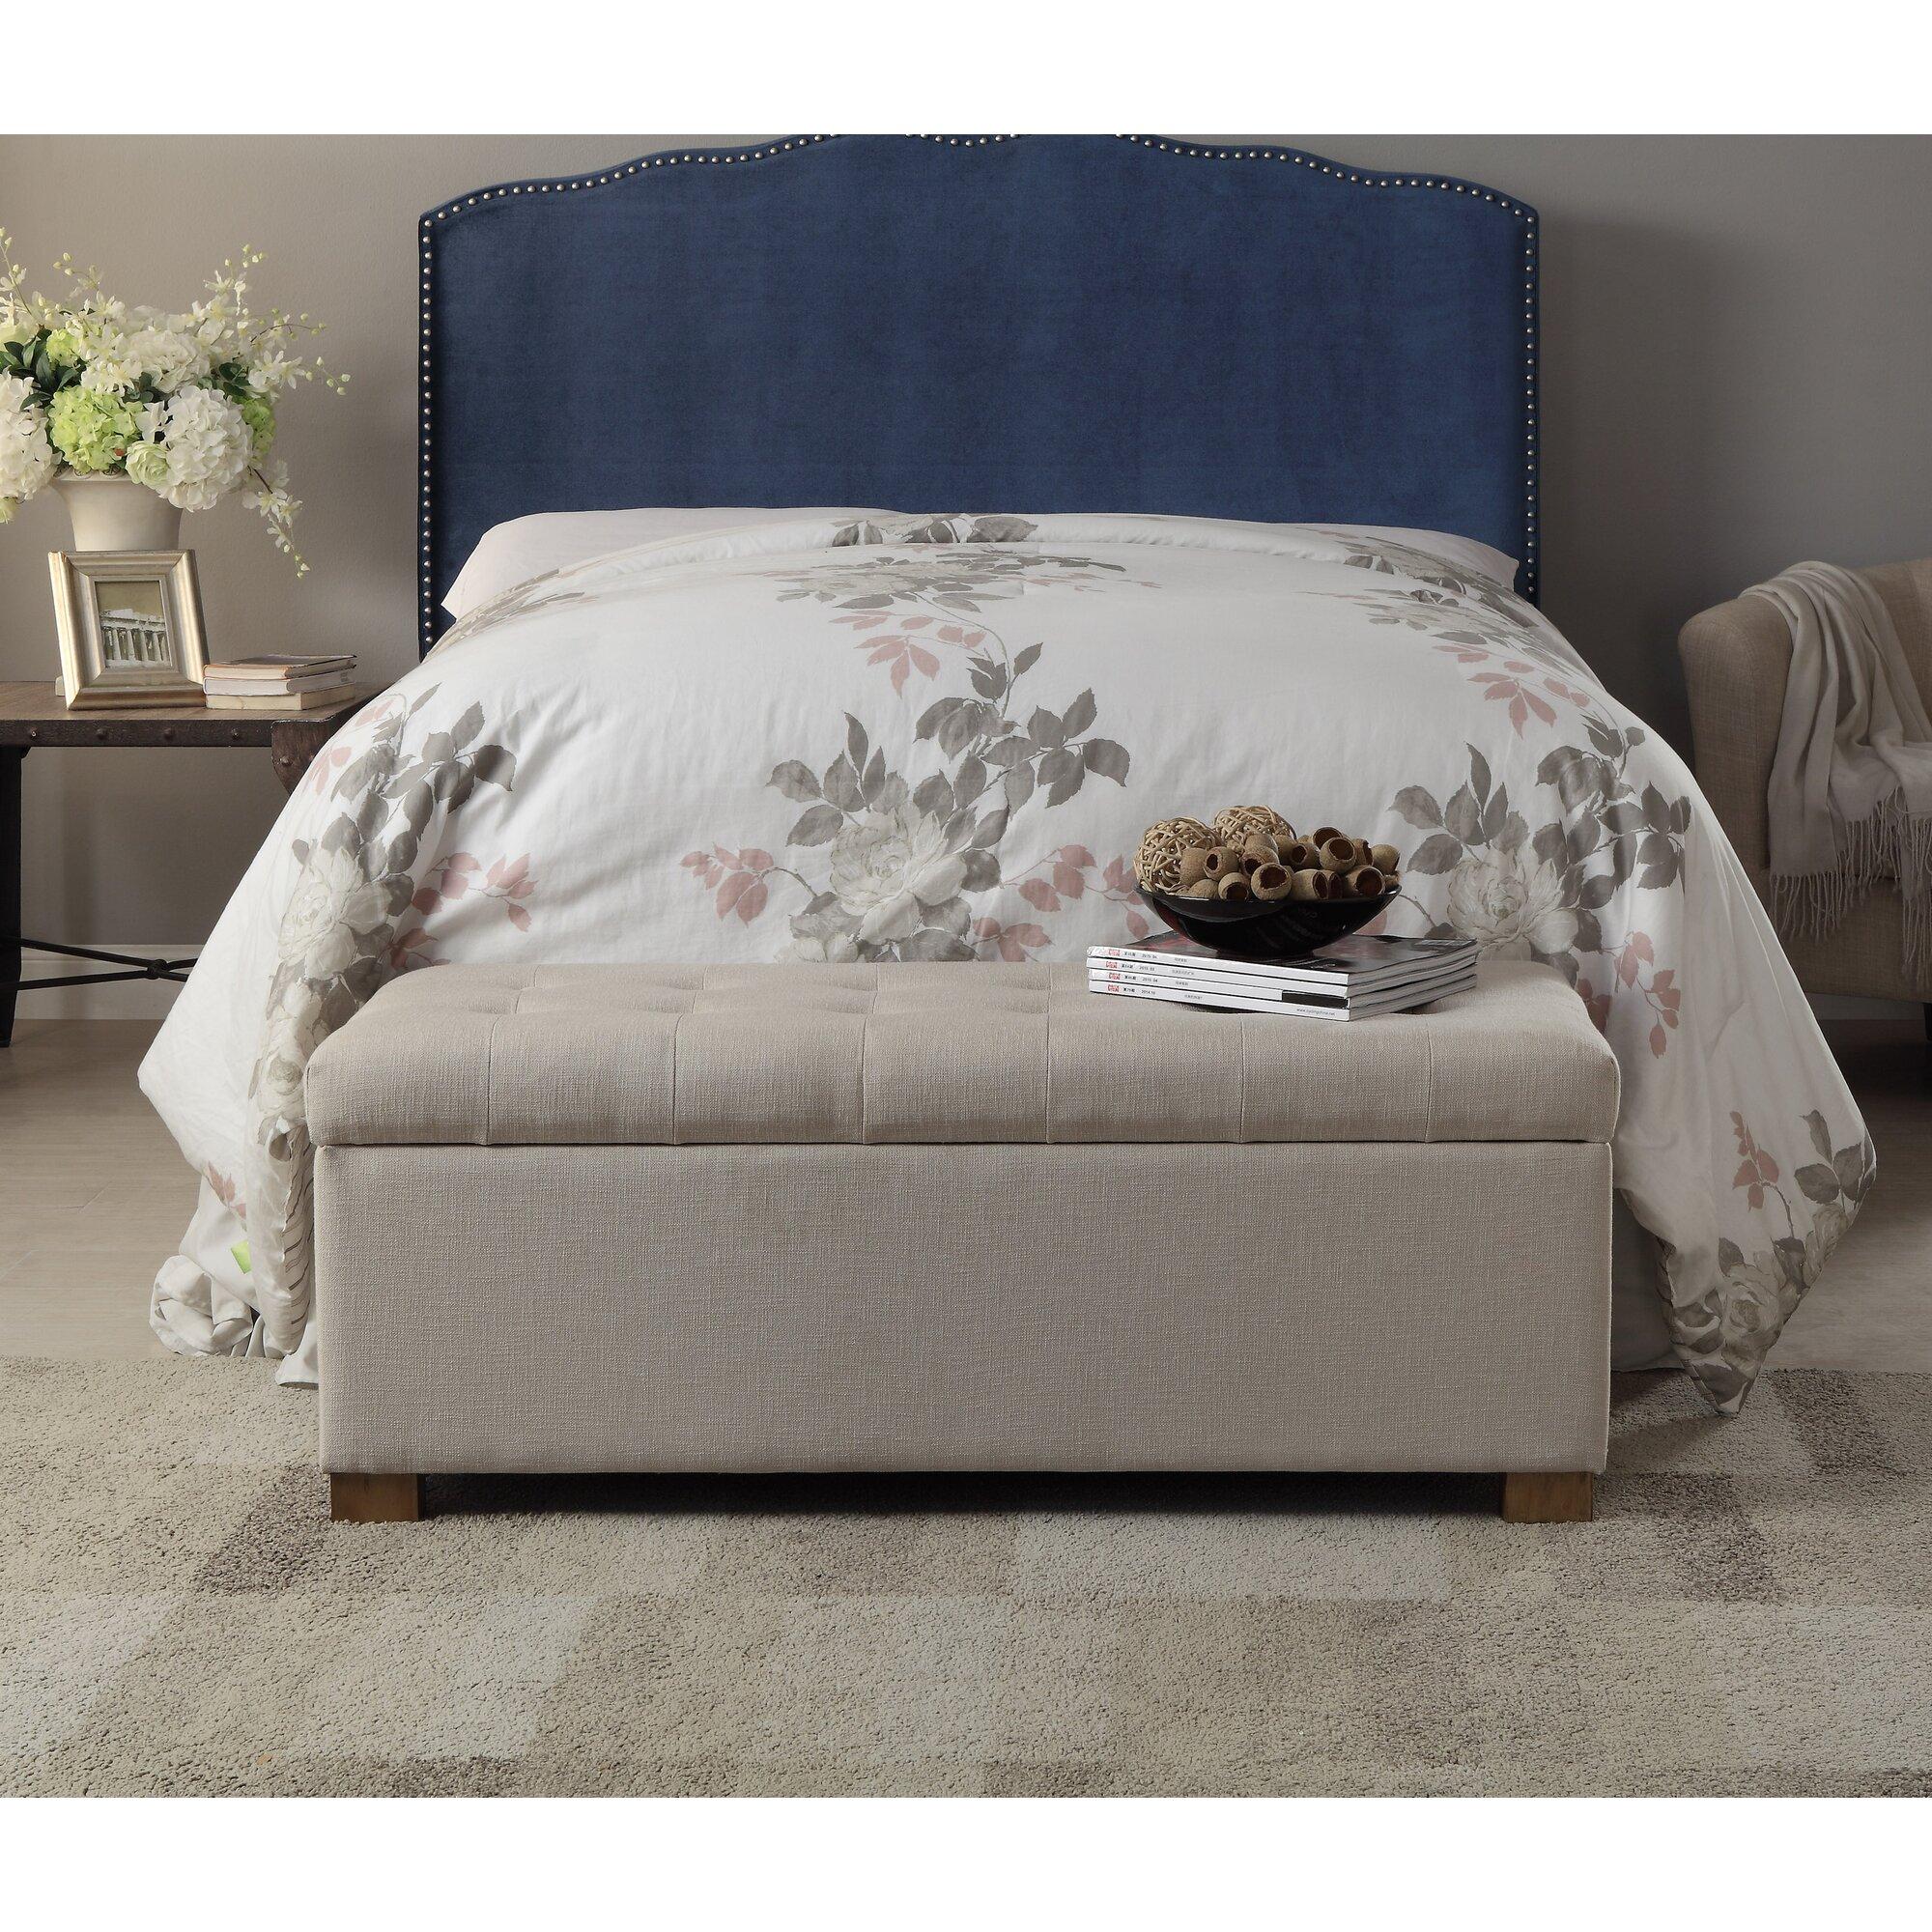 andover mills ravenwood wood storage bedroom bench reviews wayfair. Black Bedroom Furniture Sets. Home Design Ideas